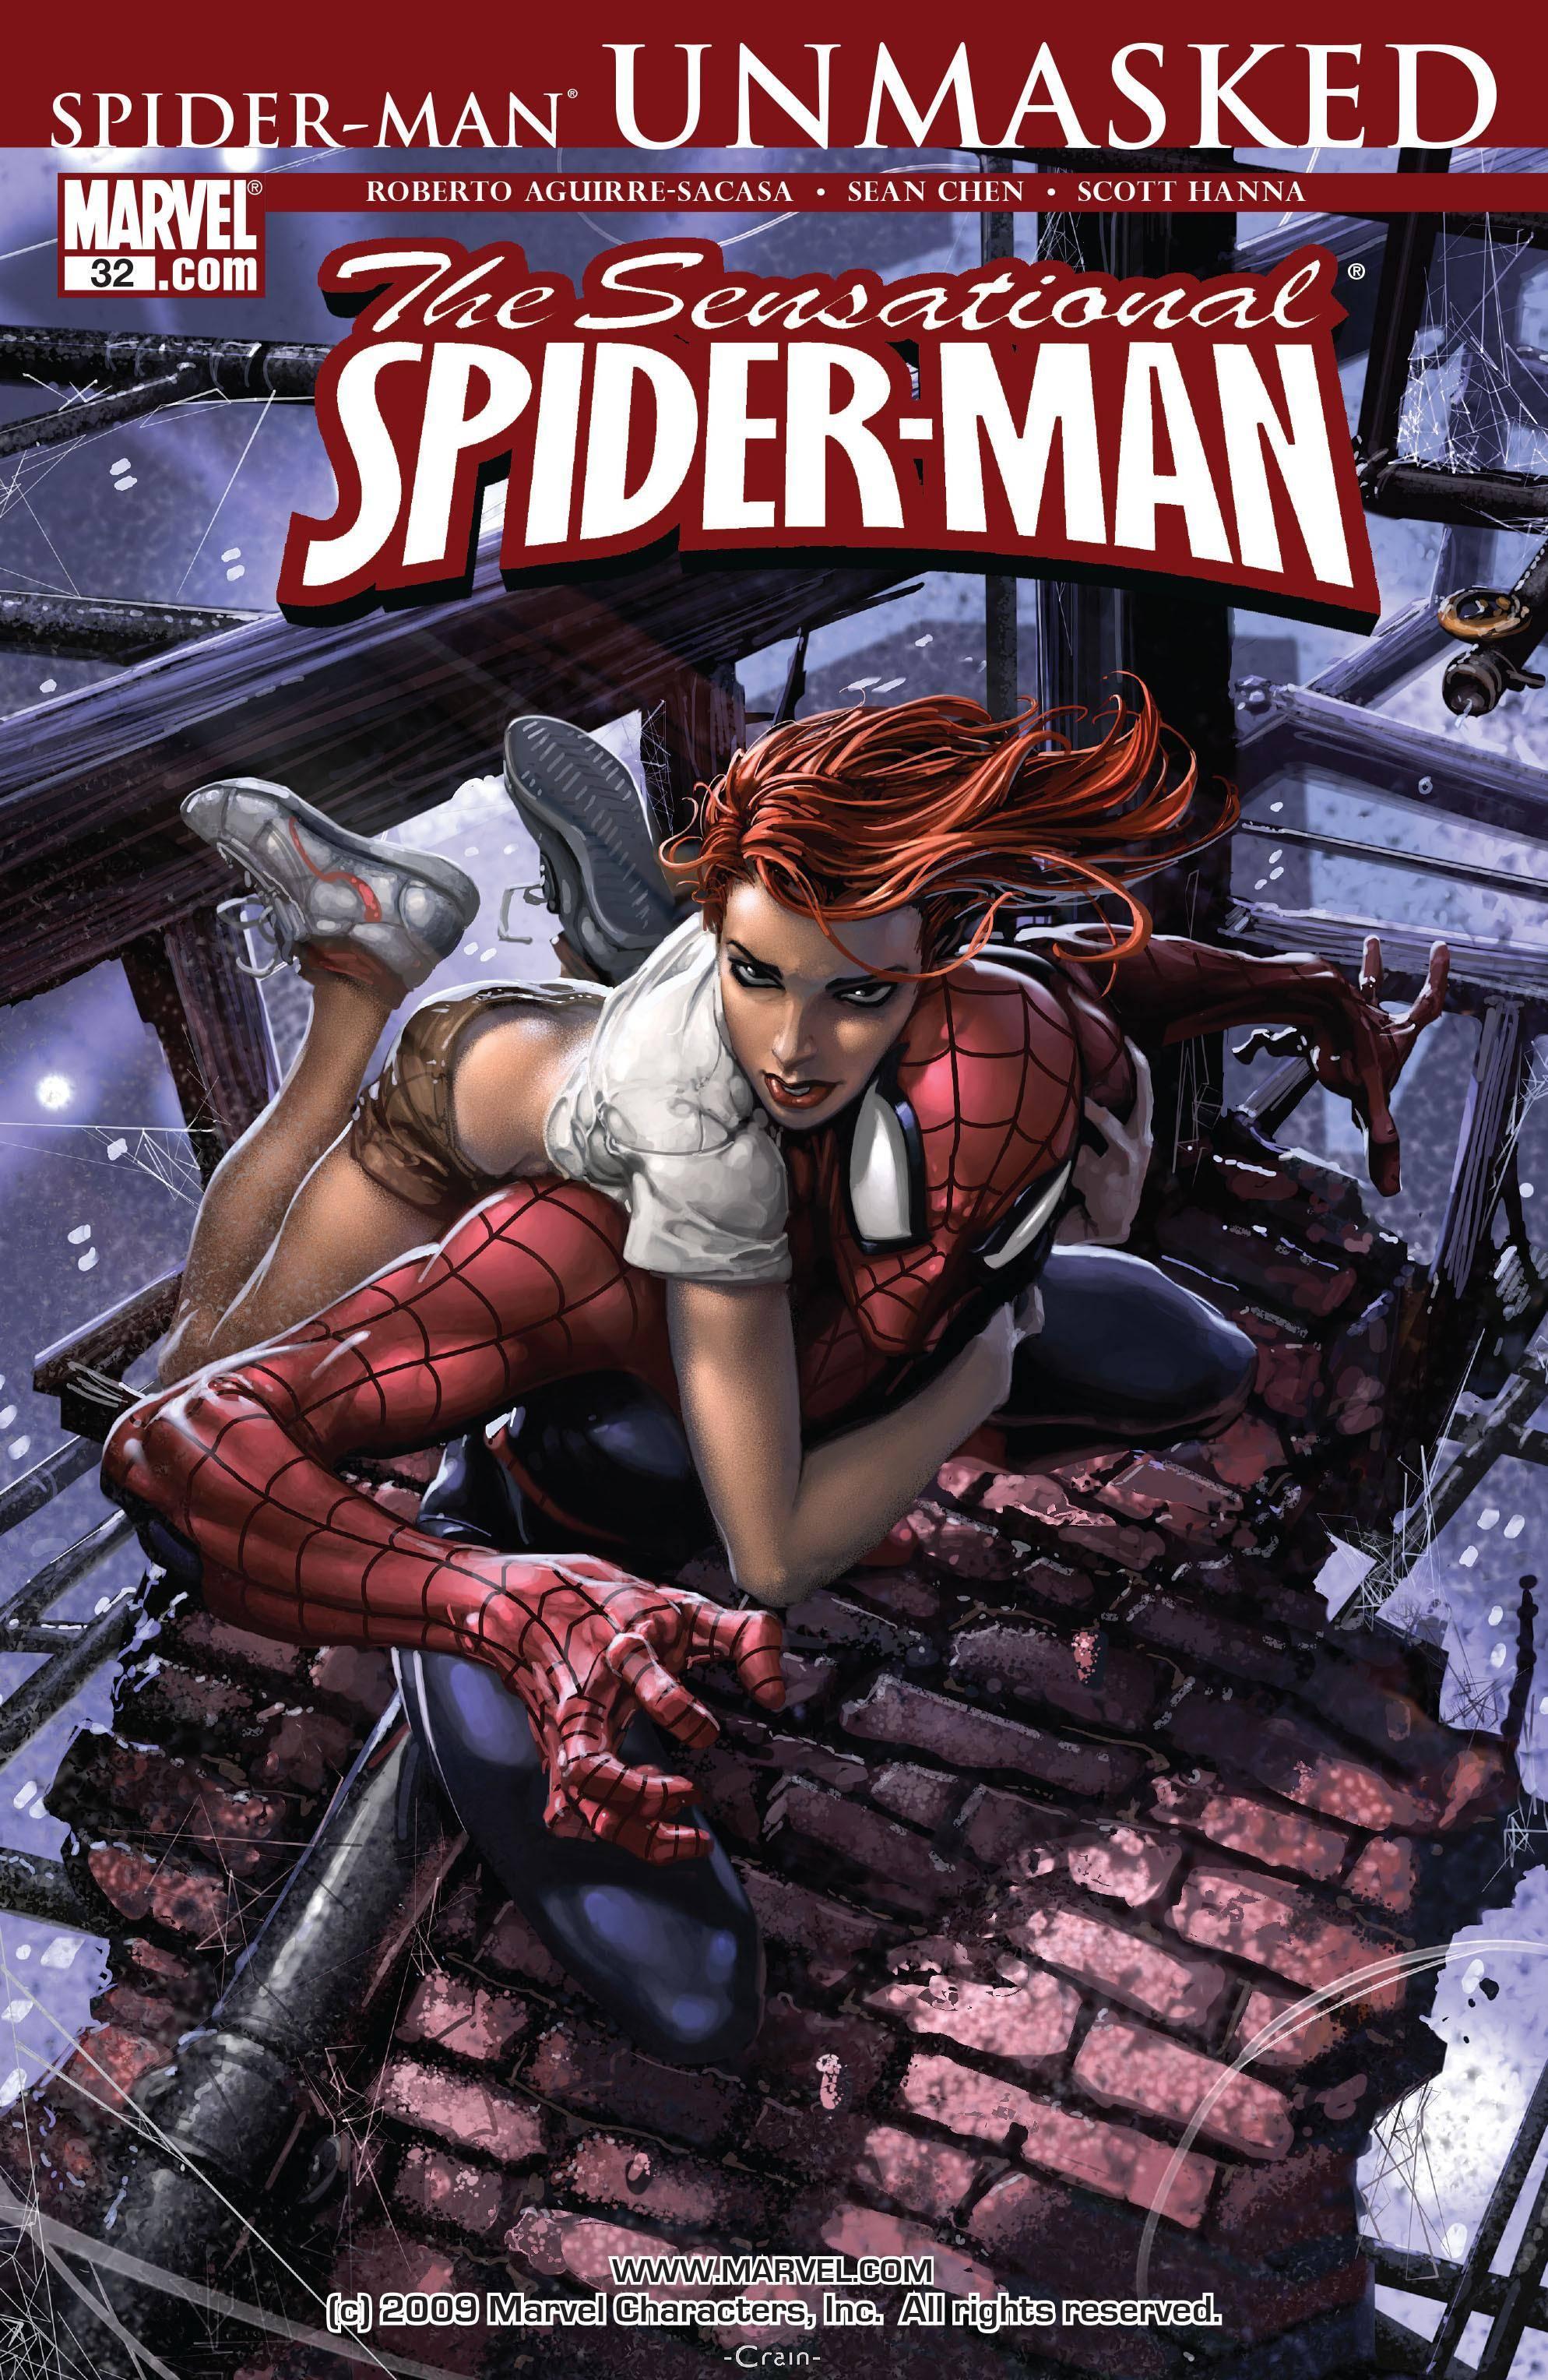 The Sensational Spider-Man 032 2007 digital